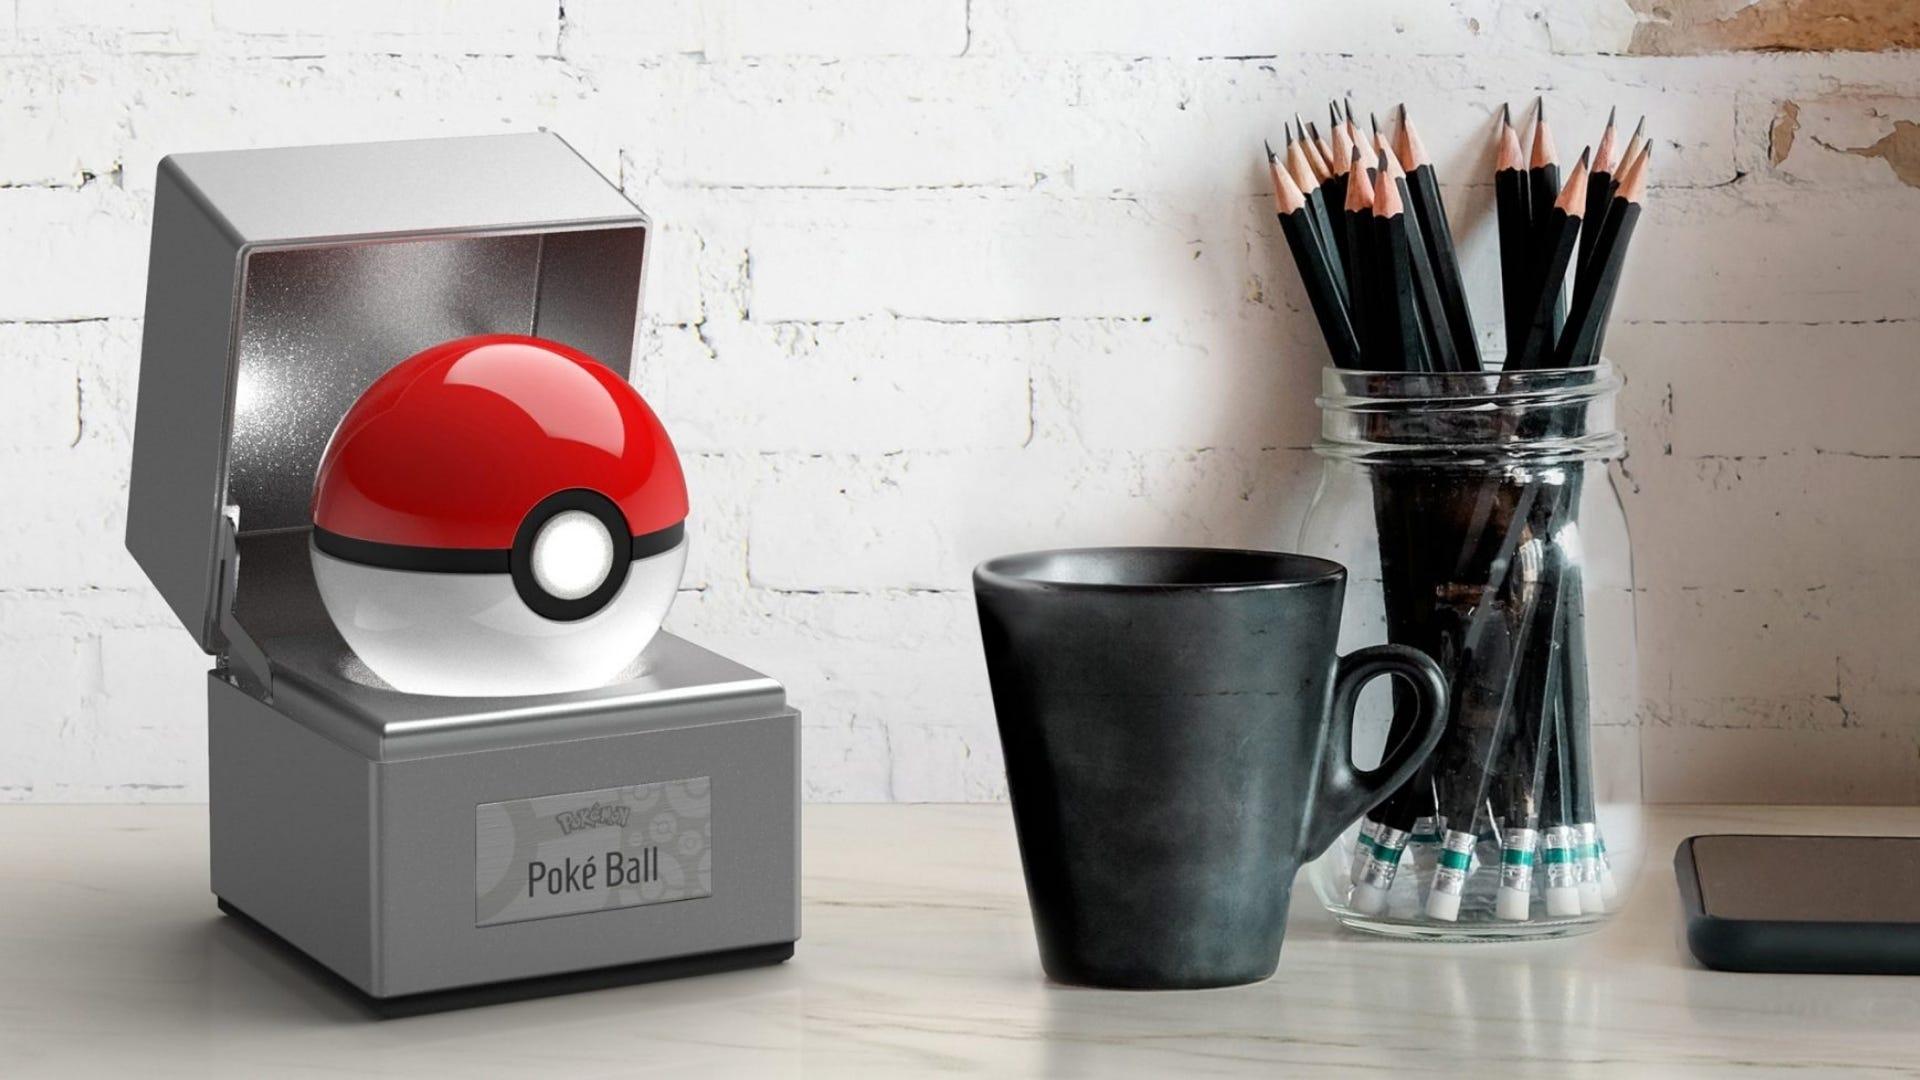 A Poke Ball replica sits on a table next to a mug and pencils.